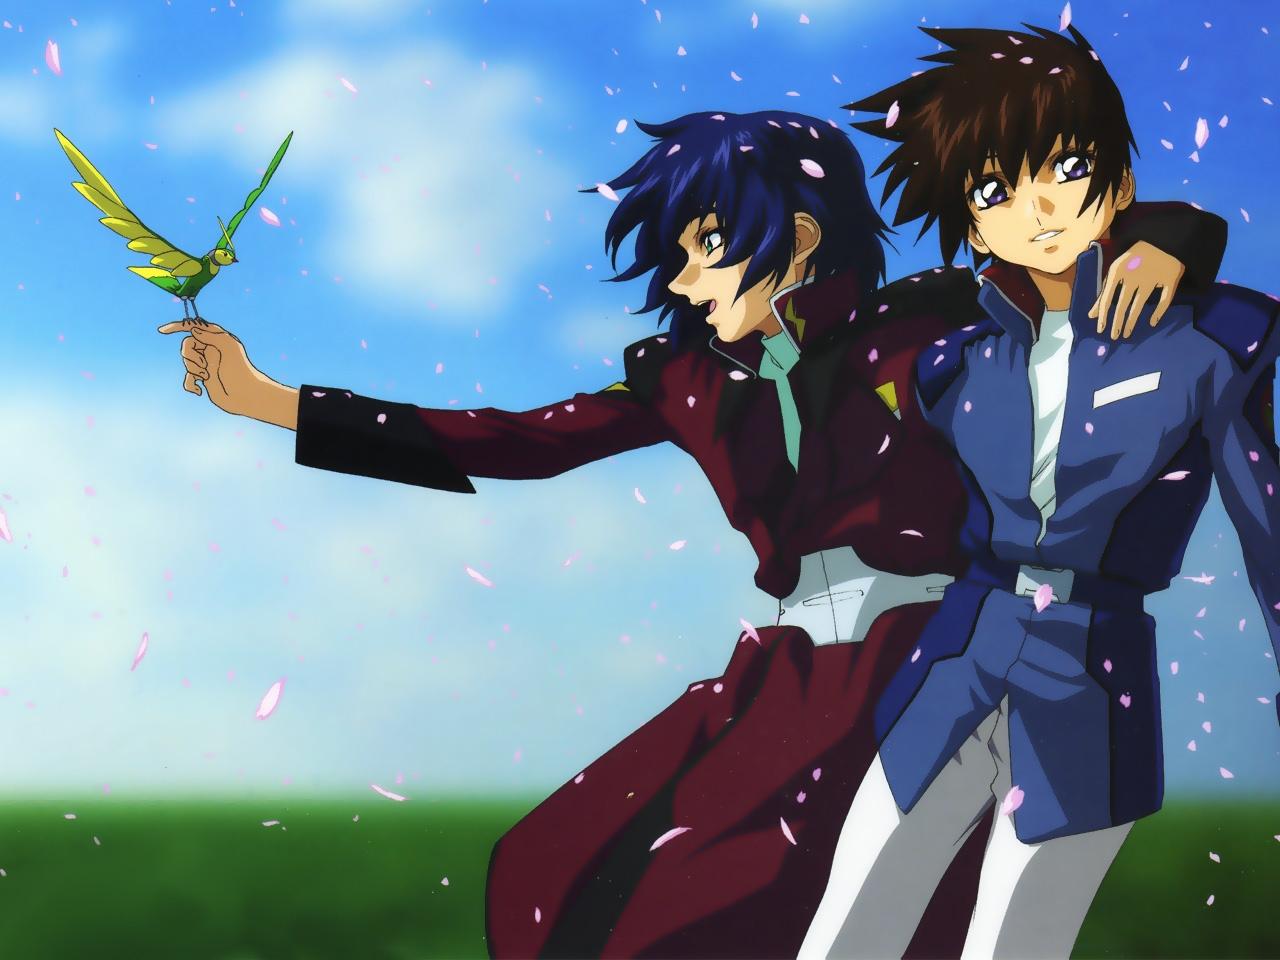 Anime <b>Girls</b> images <b>Gundam SEED</b> Destiny <b>Girls</b> HD <b>wallpaper</b> and ...